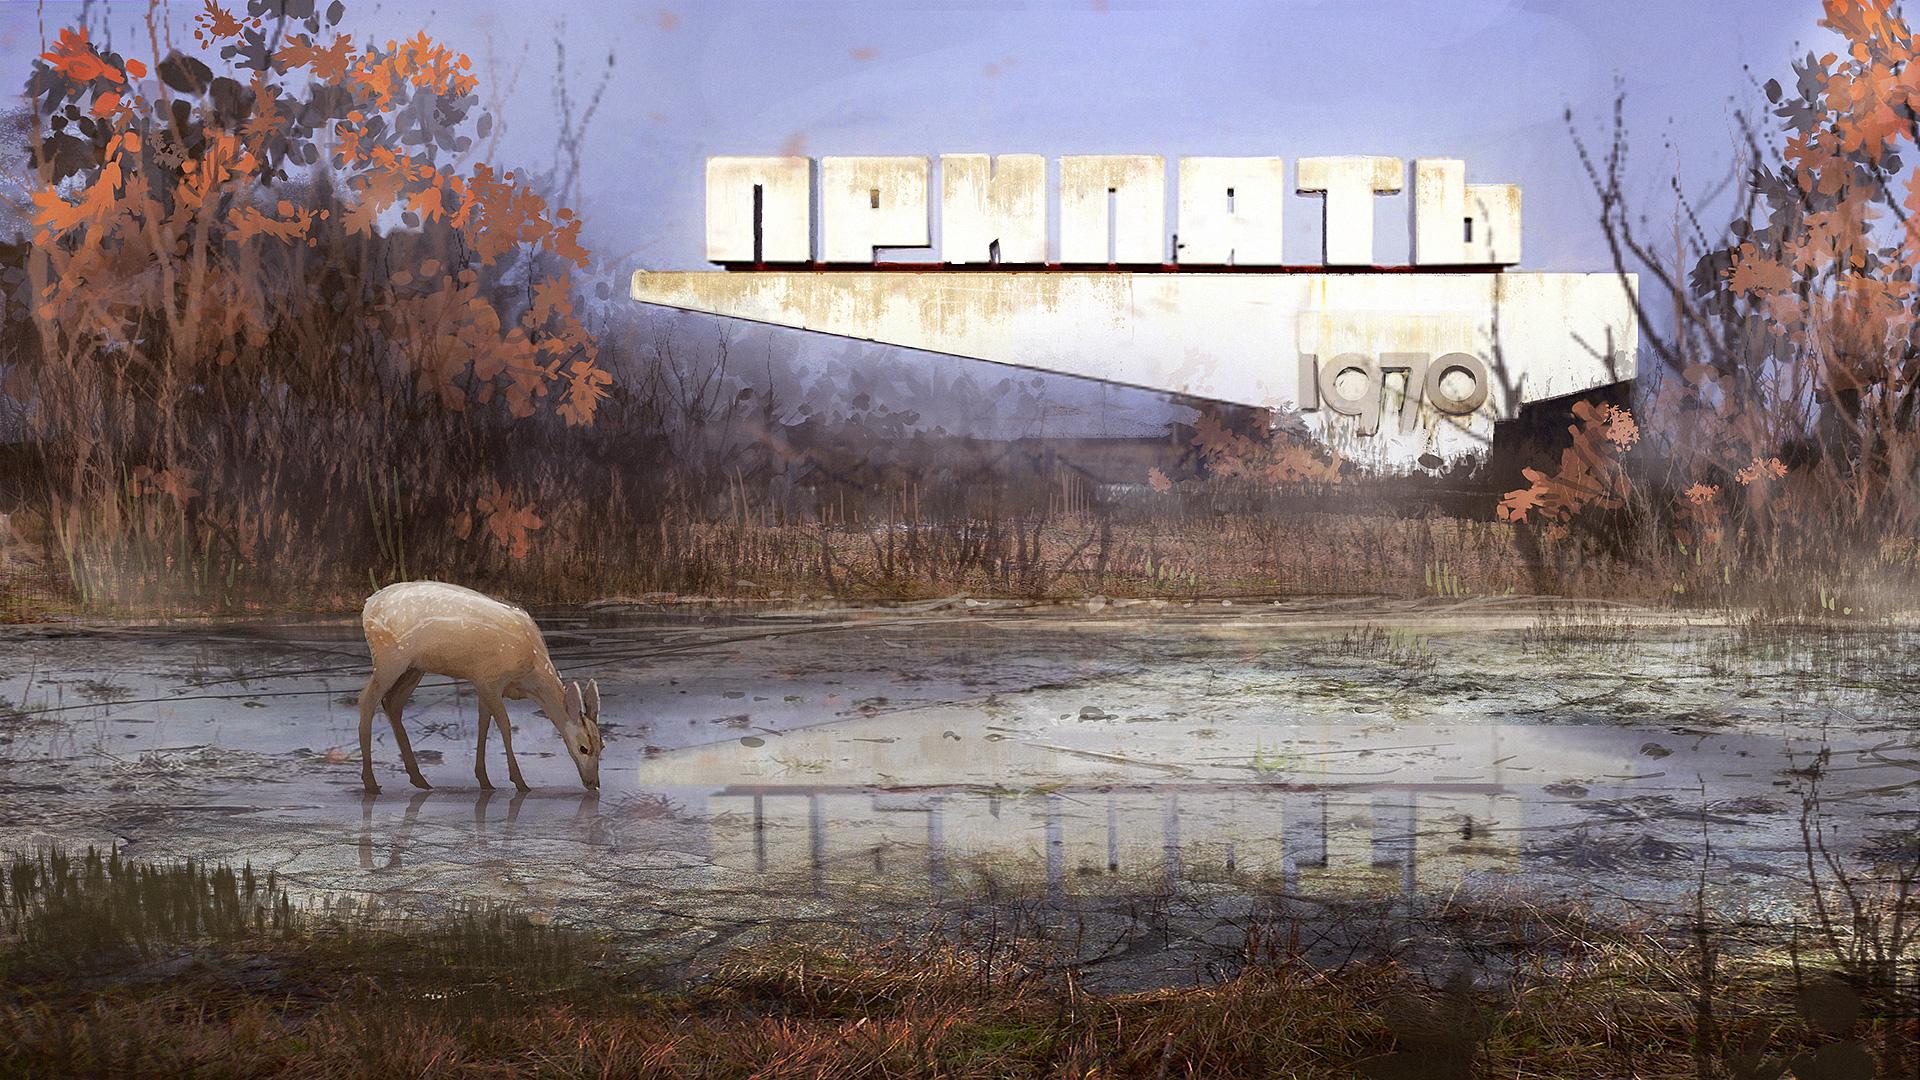 Welcome to Pripyat by MacRebisz